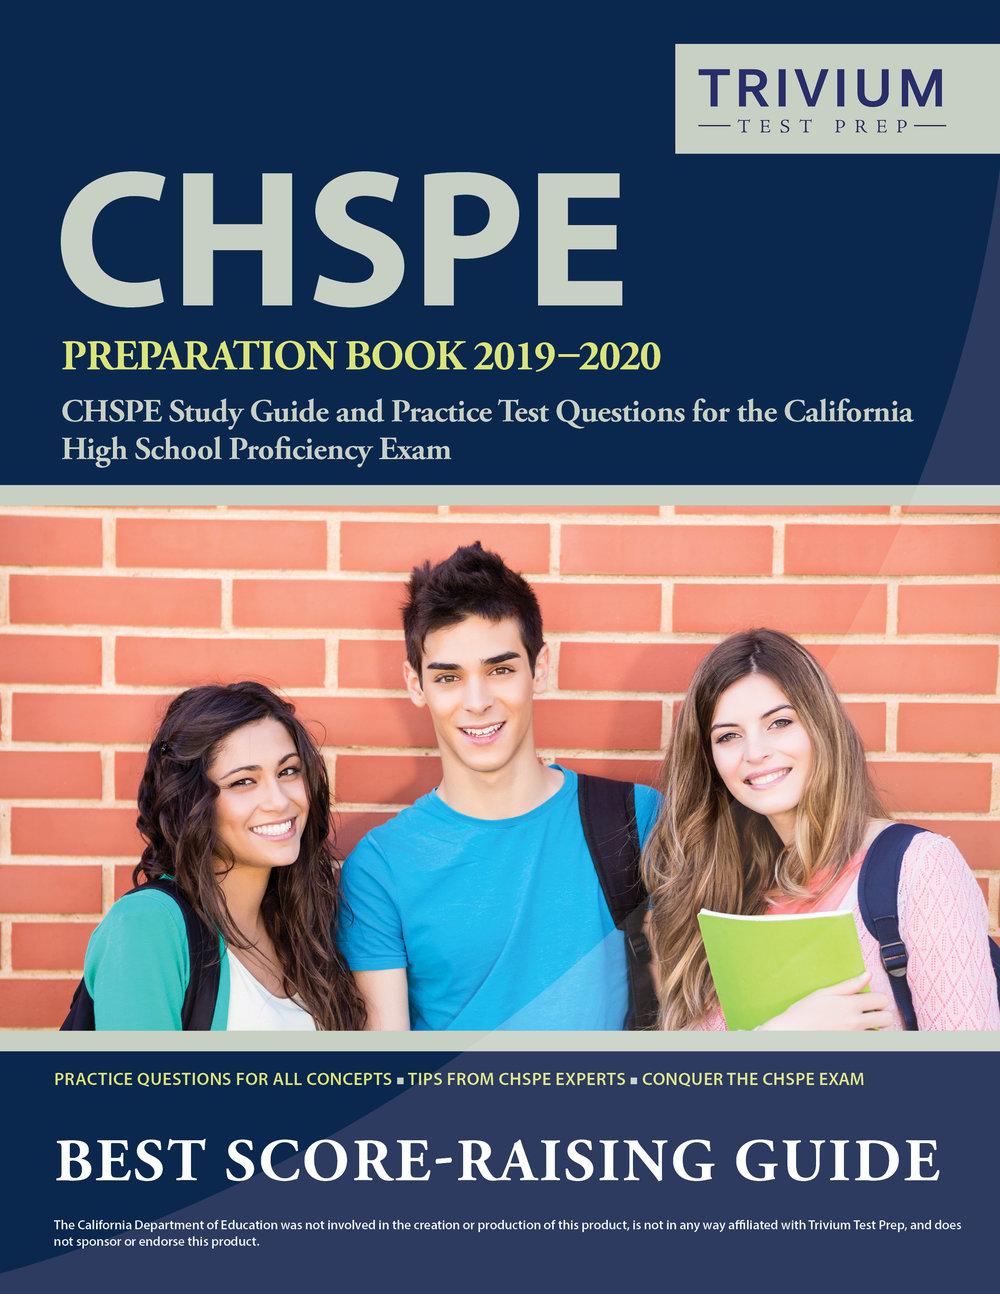 CHSPE_2019_cover_website.jpg